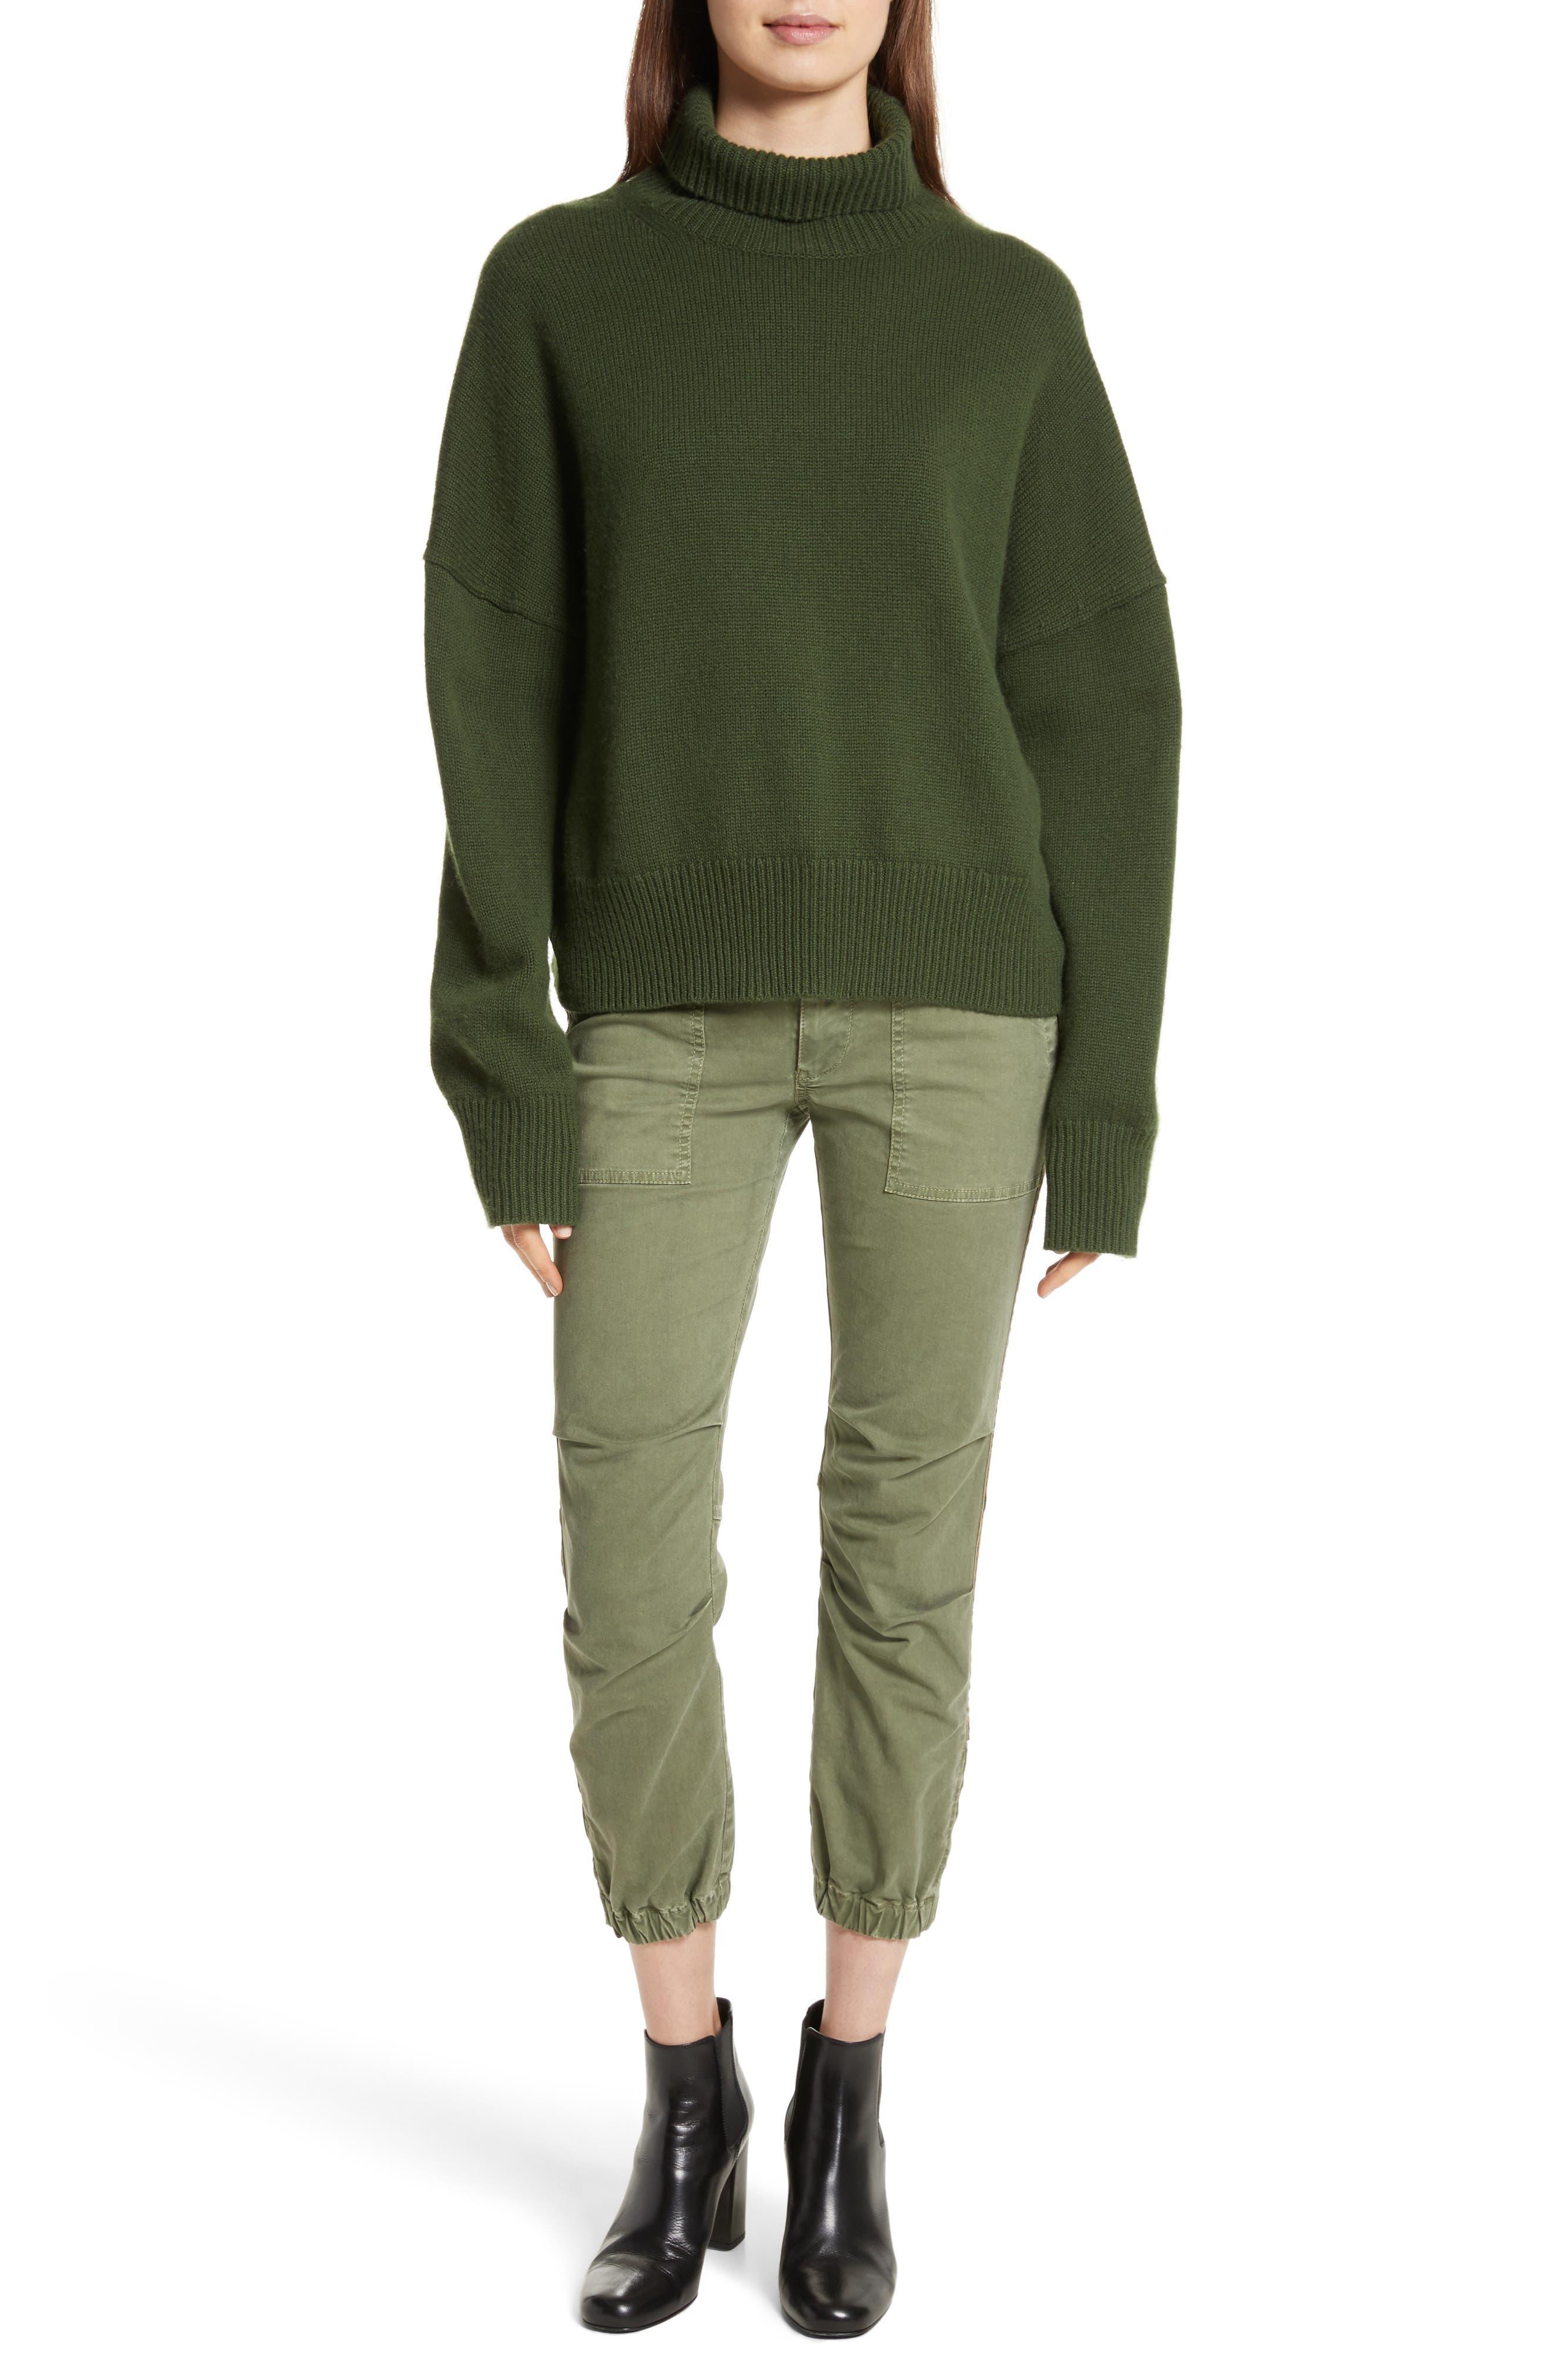 Serinda Wool & Cashmere Turtleneck Sweater,                             Alternate thumbnail 7, color,                             303